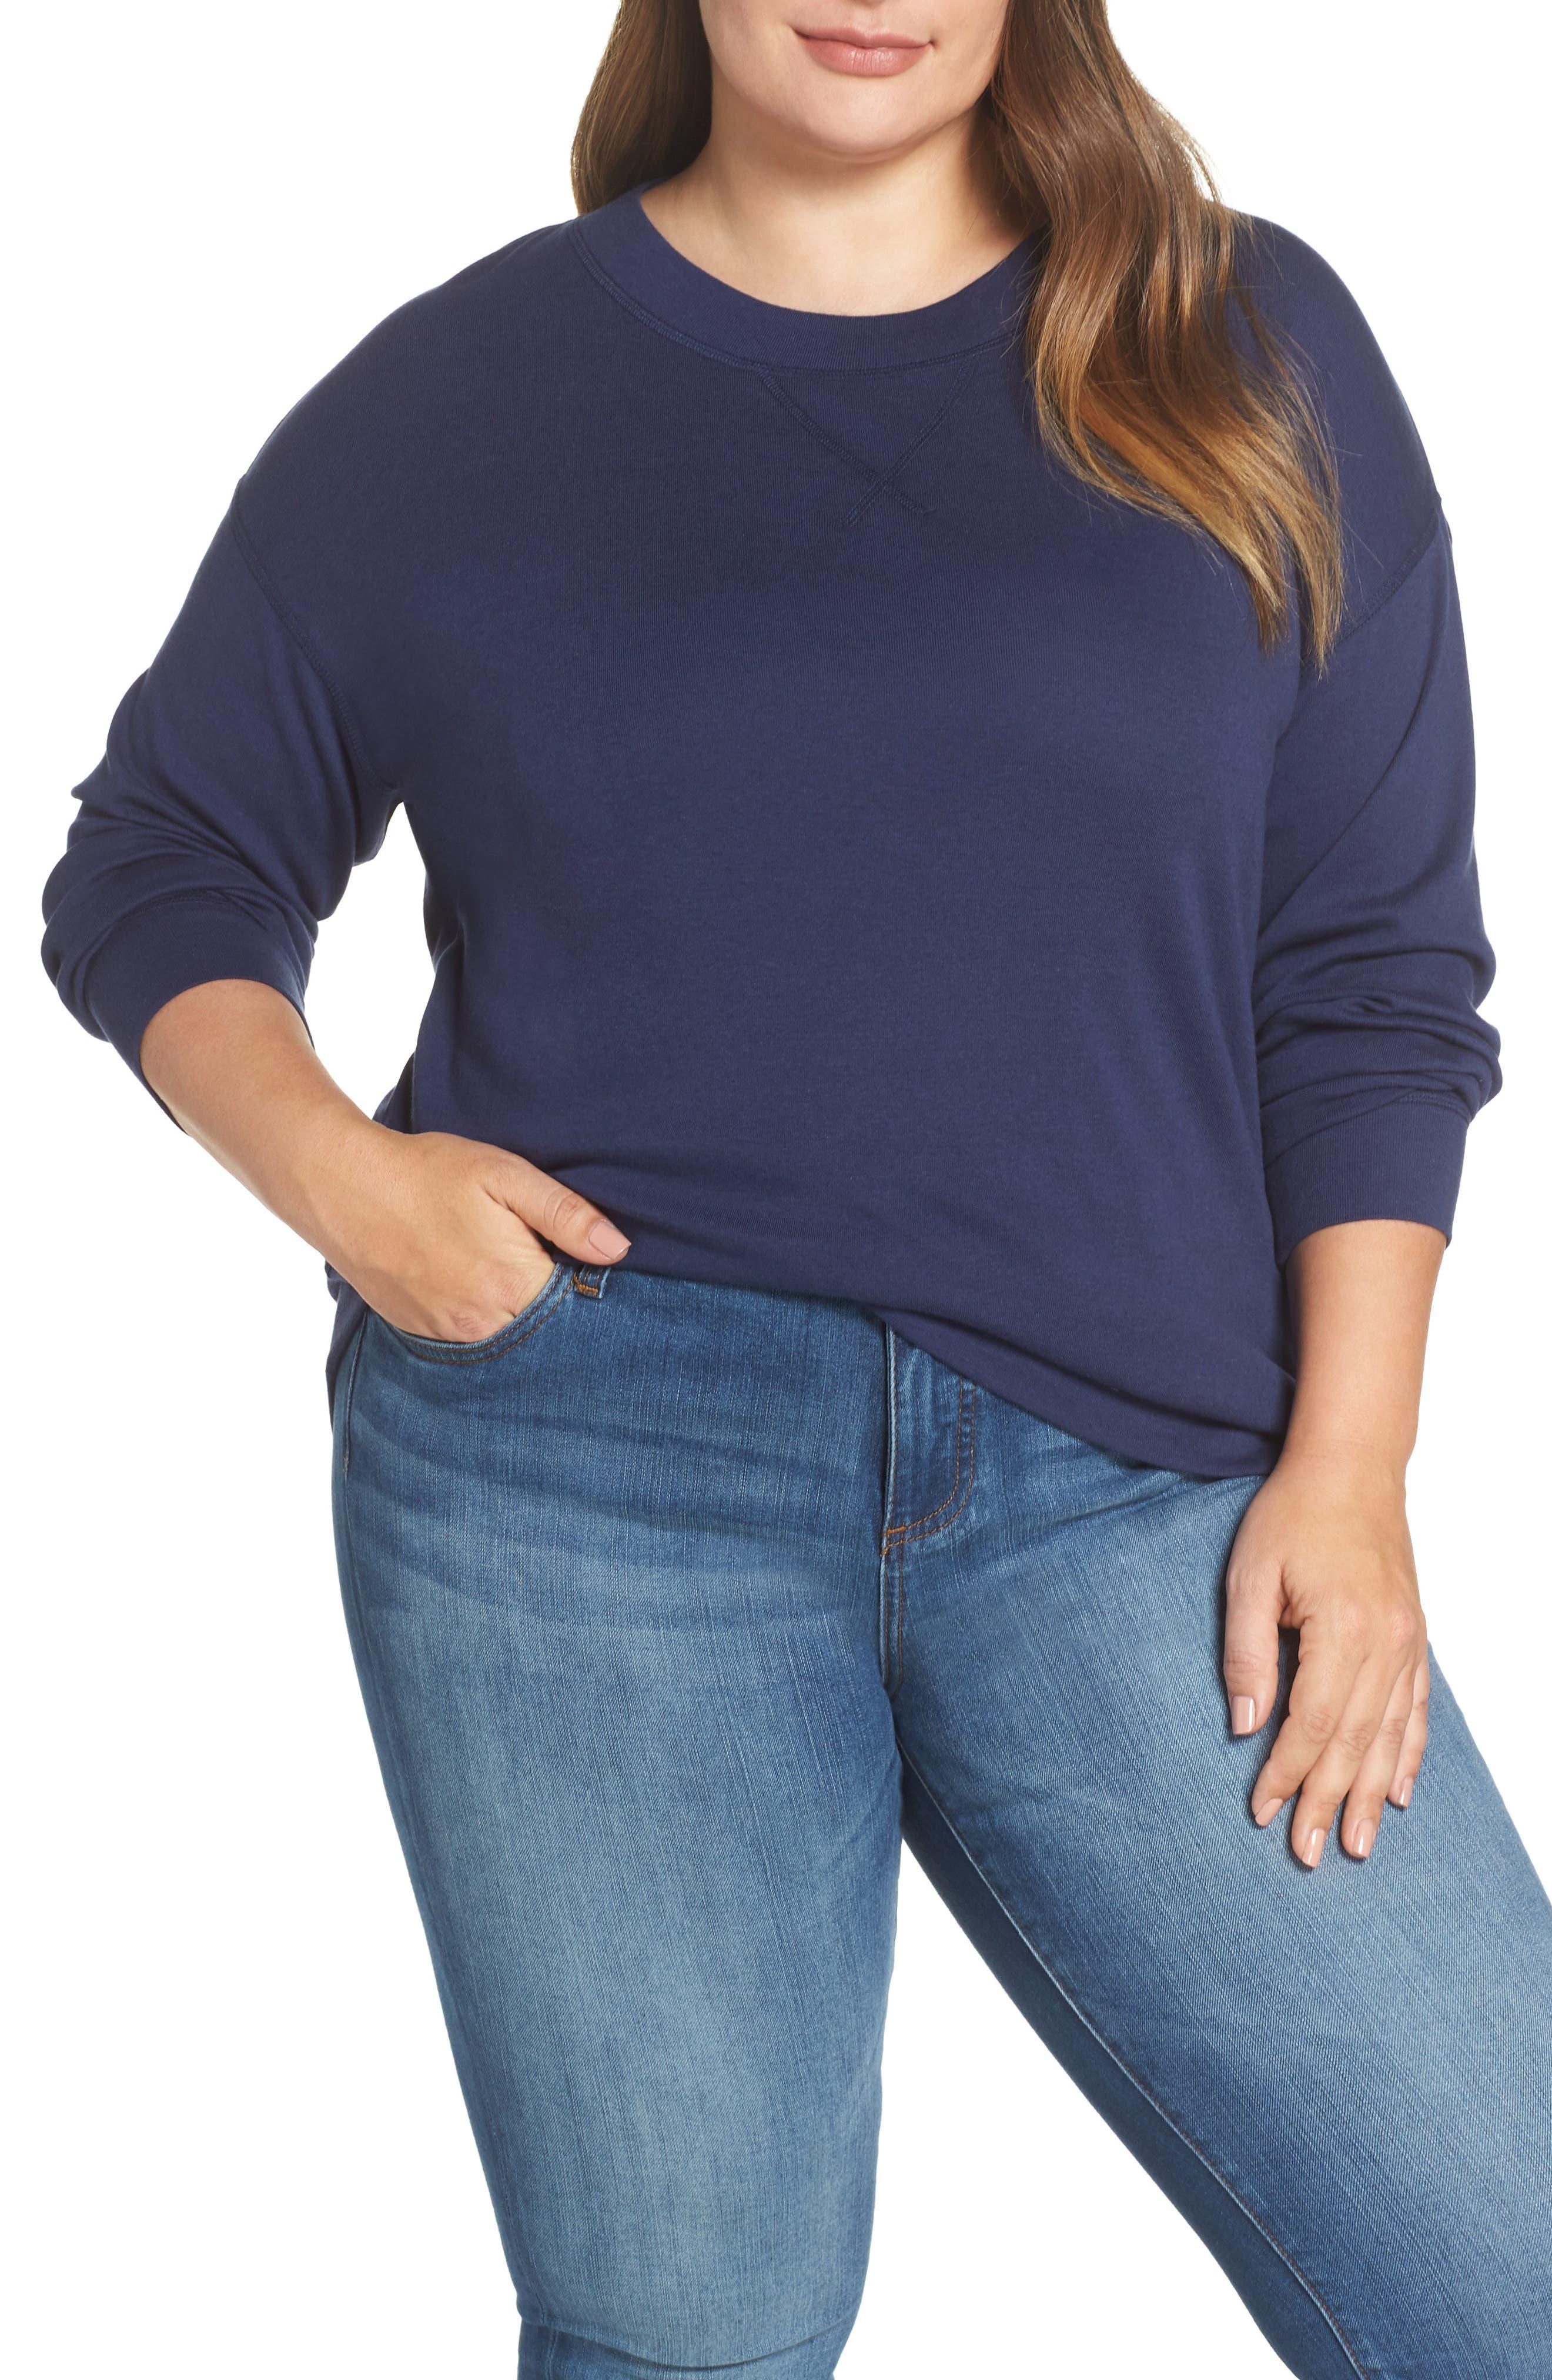 CASLON<SUP>®</SUP> Crewneck Sweatshirt, Main, color, NAVY PEACOAT